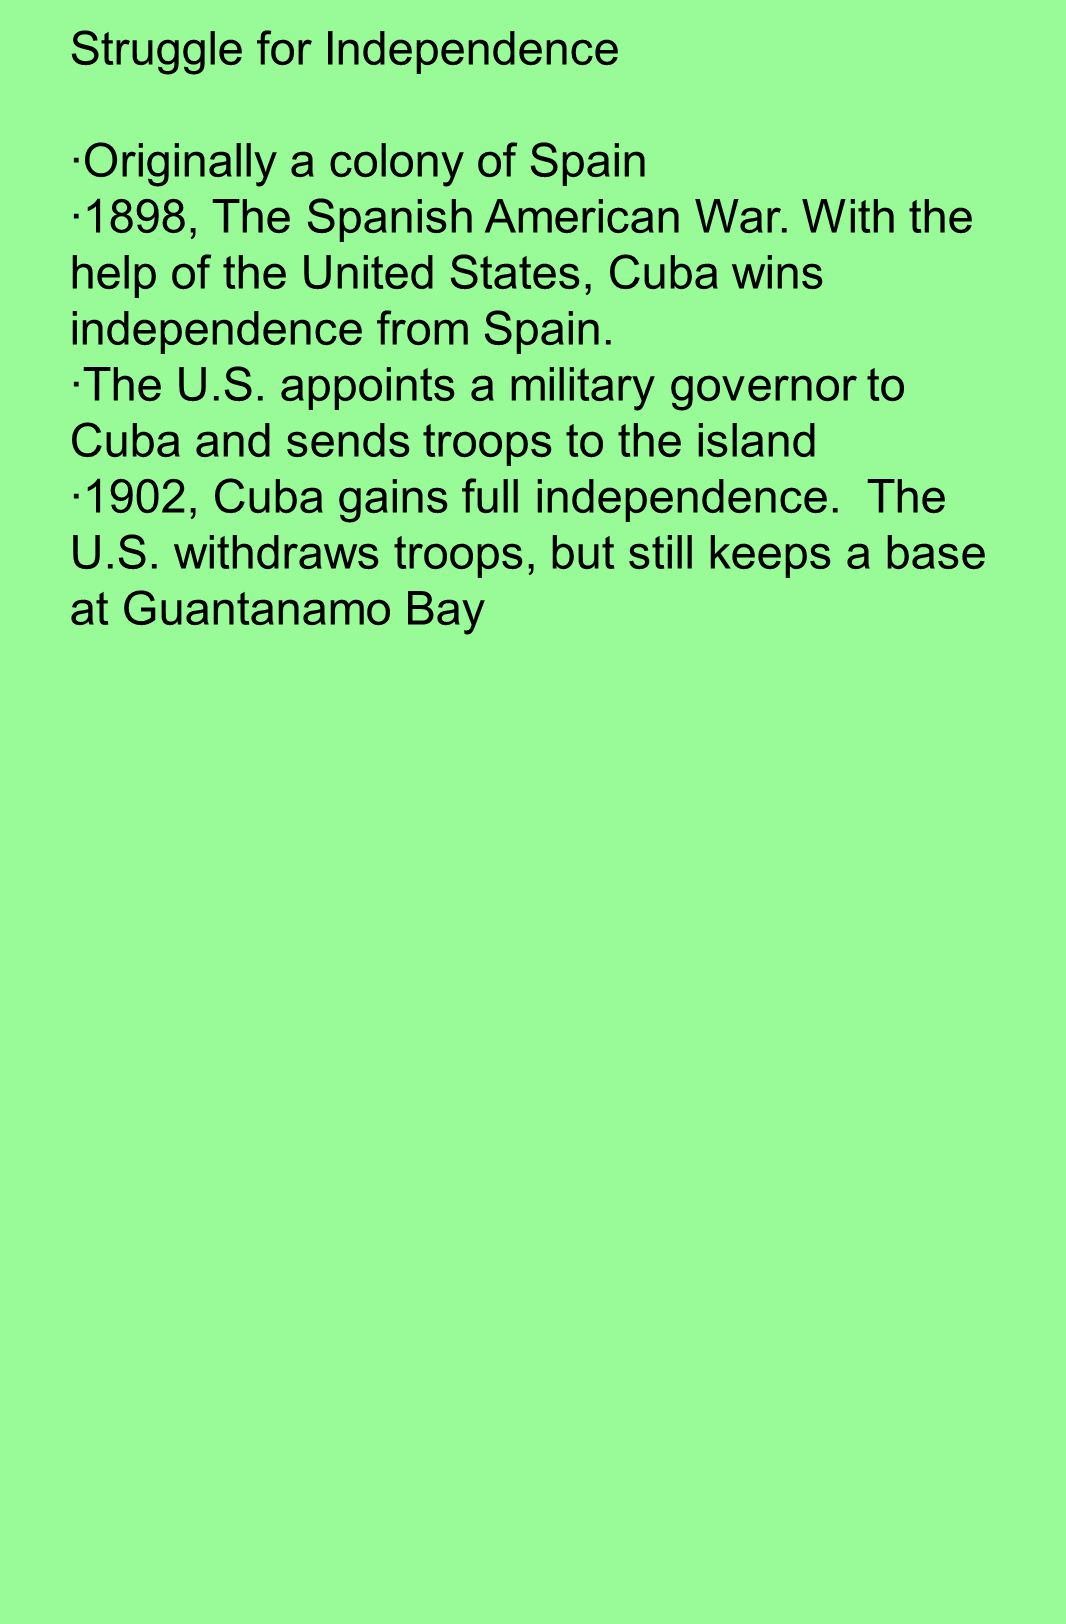 Cuba: The richest island in the Caribbean.